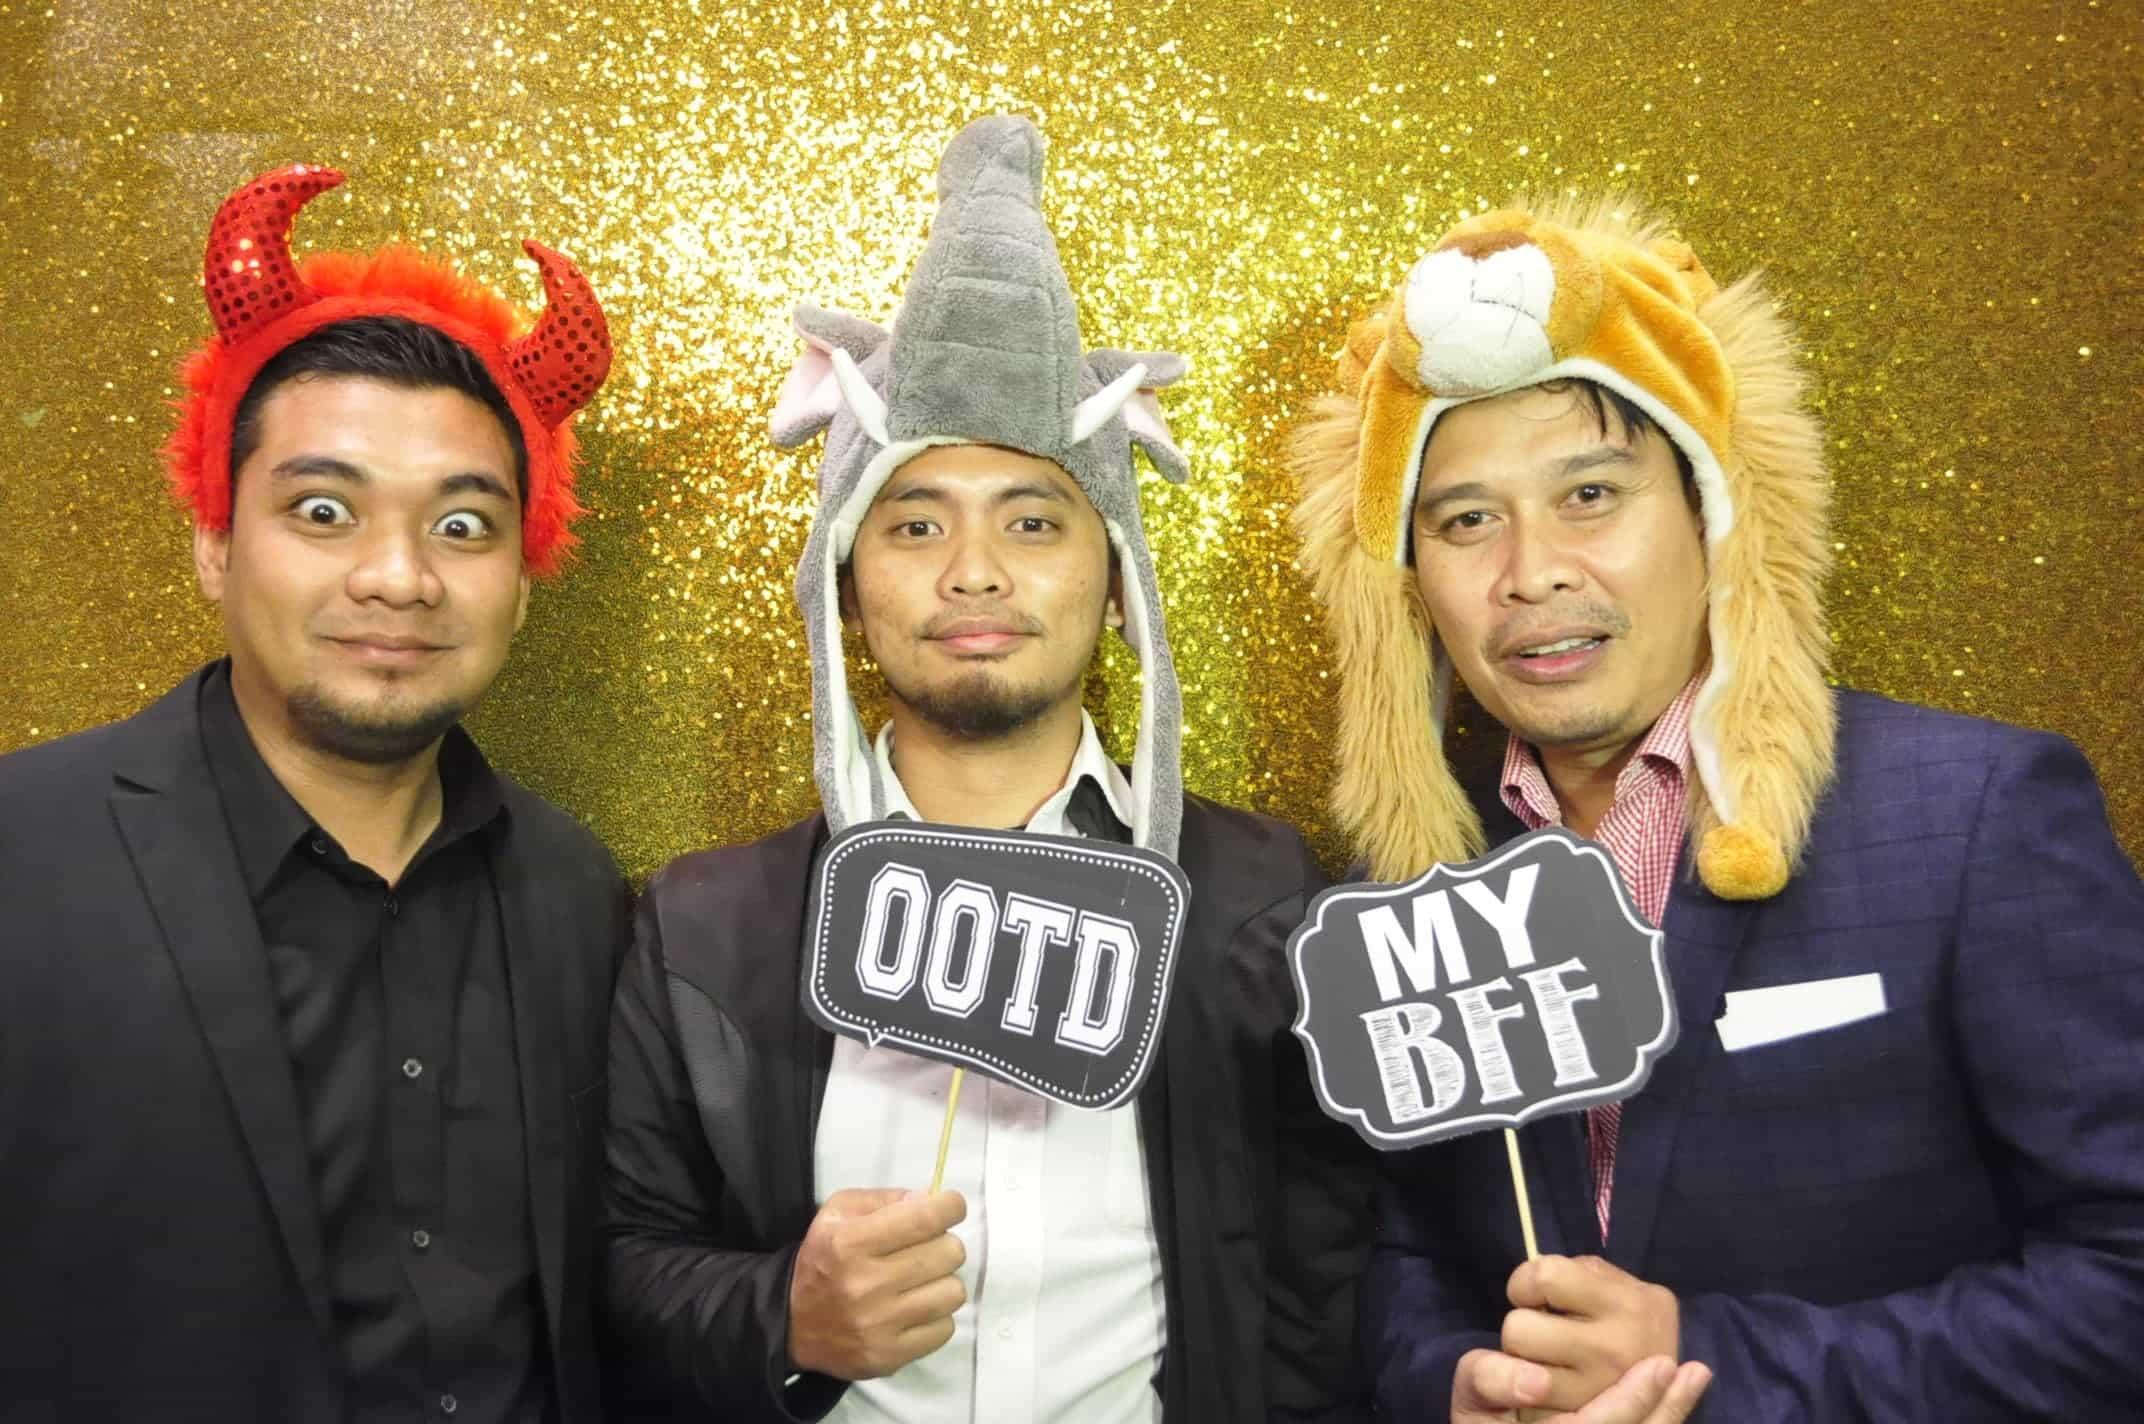 Malam Gala Anggun 2018 (Photobooth) 17